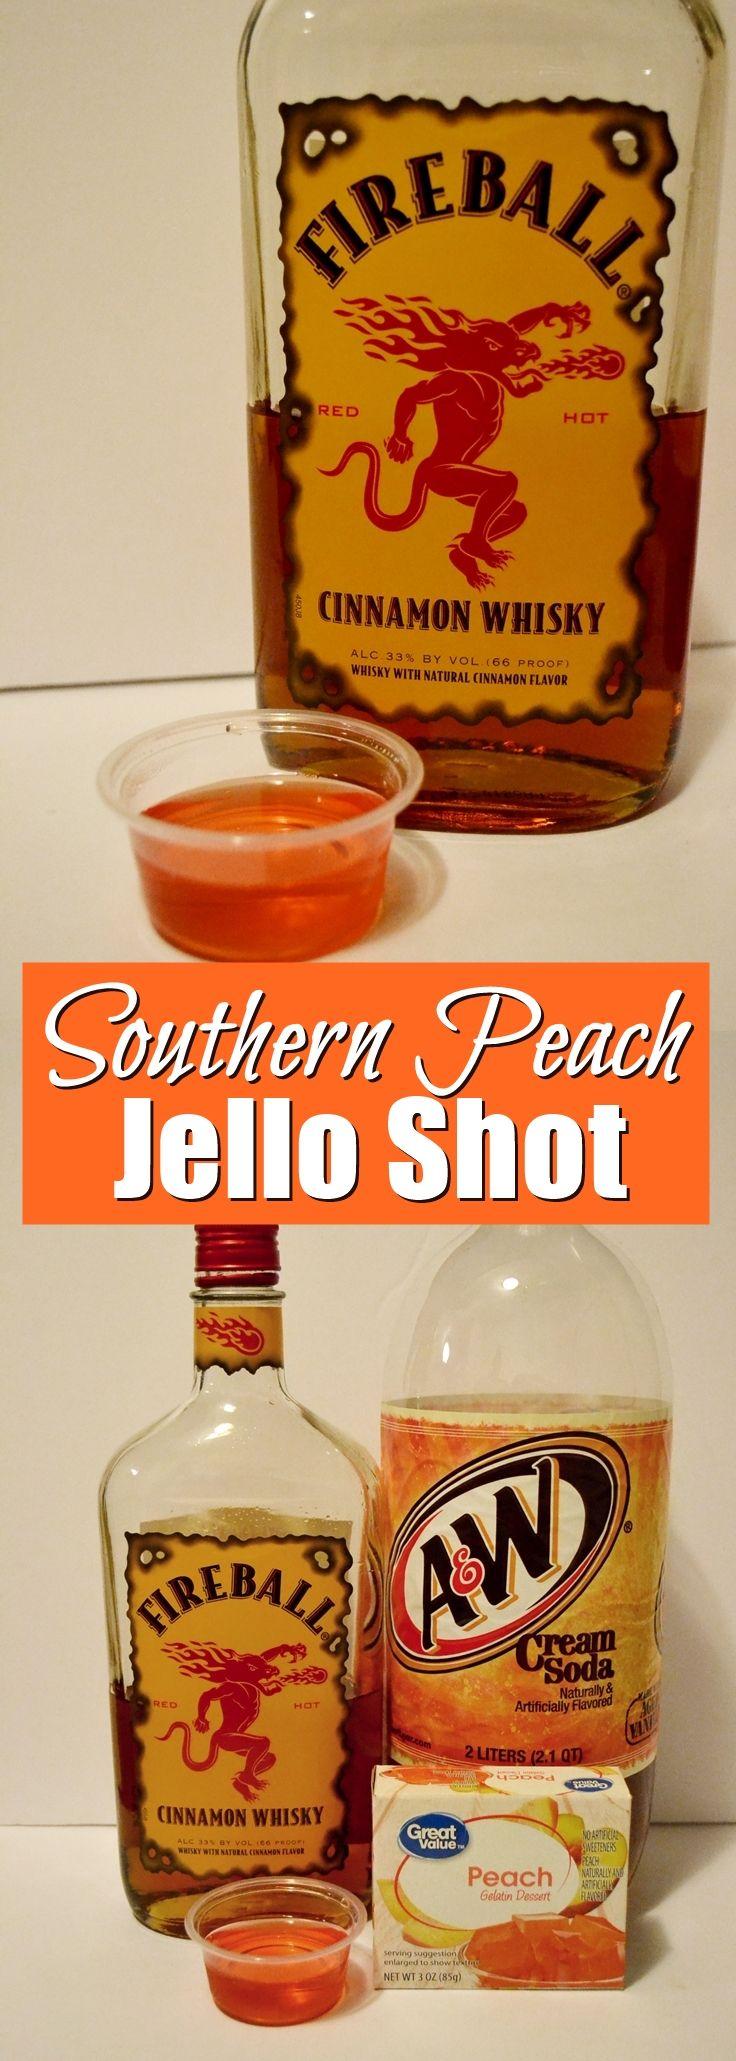 Southern Peach Jello Shot Recipe ft Fireball | Unicorn Hideout